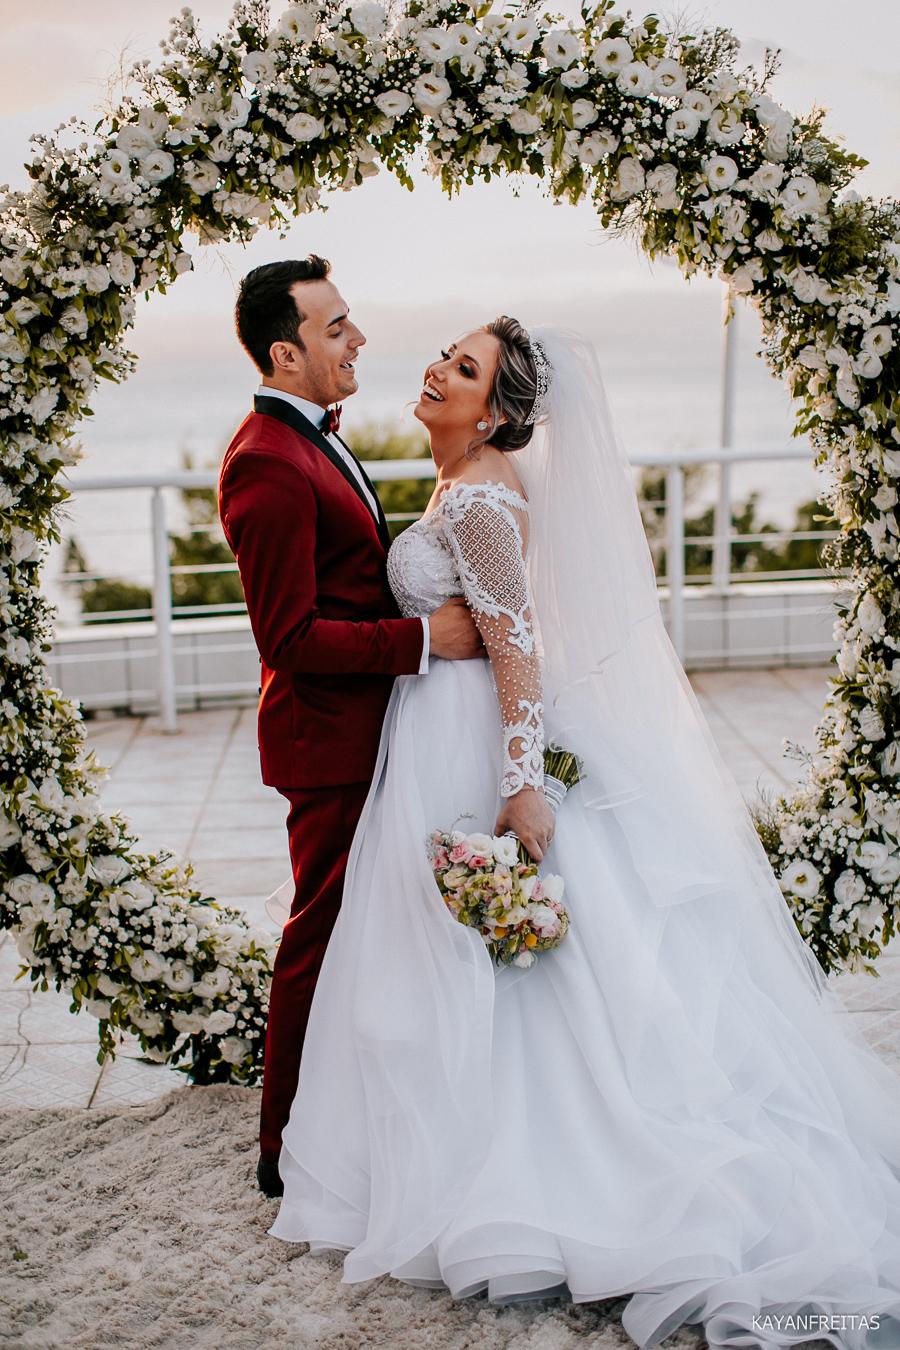 casamento-mariadomar-floripa-0112 Casamento Jéssica e Felipe - Maria do Mar Hotel